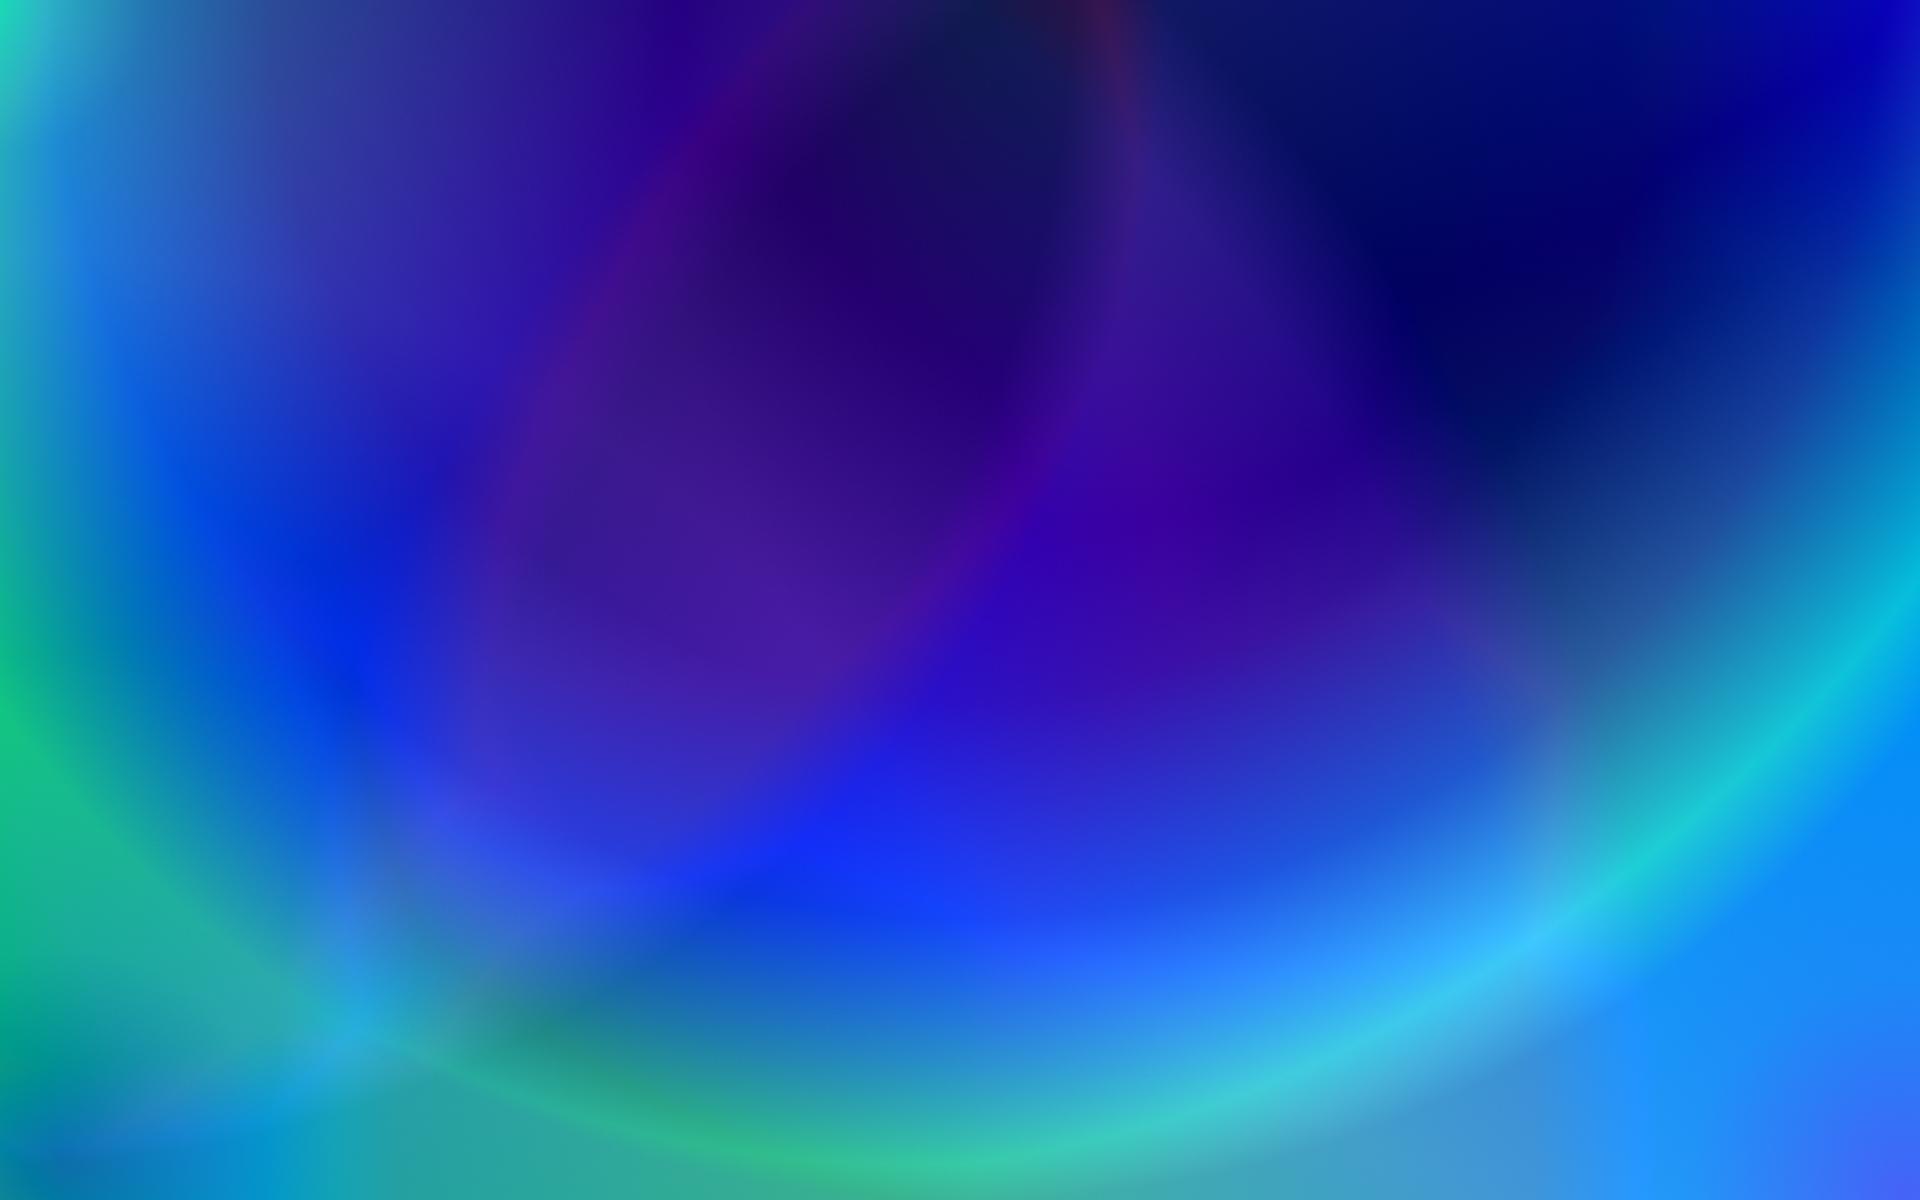 Neon Blue HD Wallpaper - WallpaperSafari